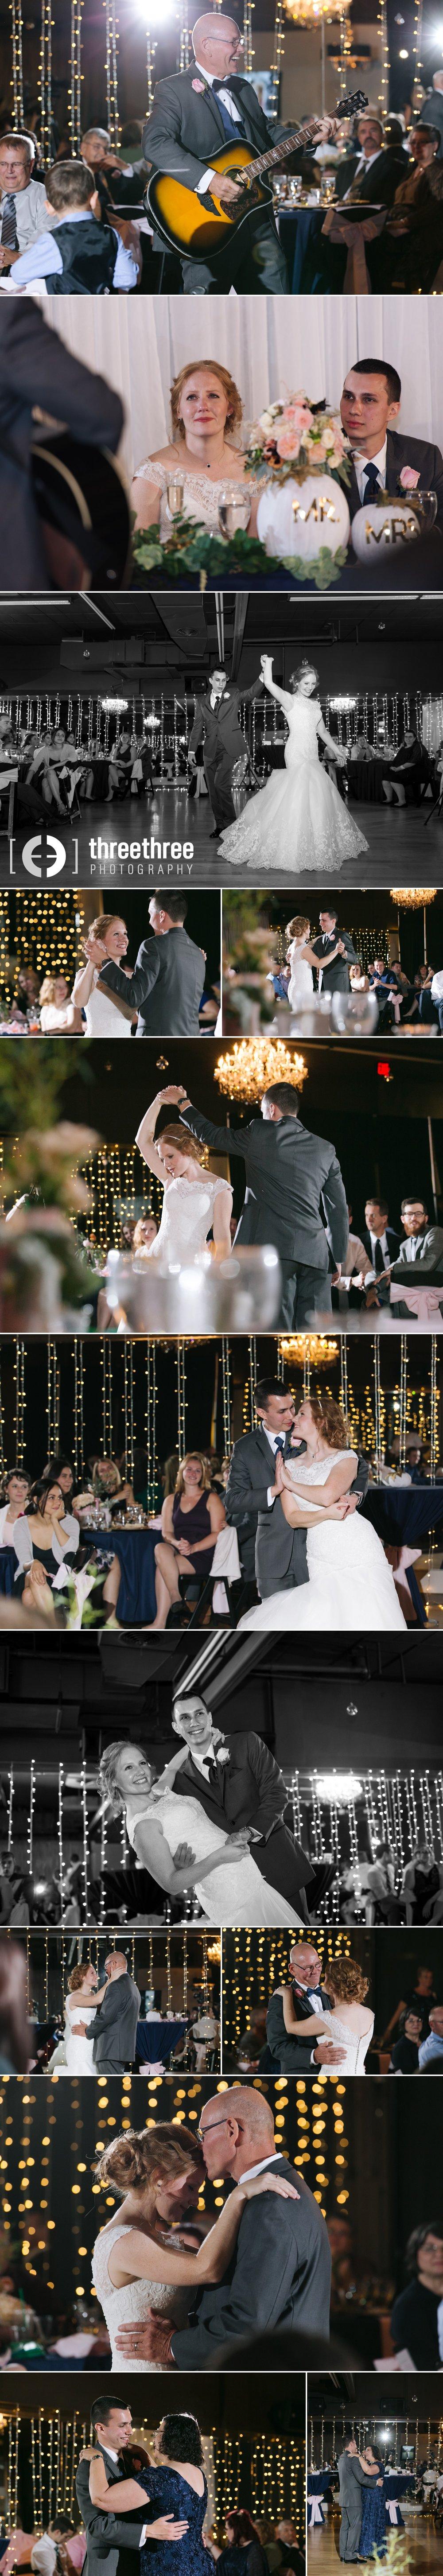 Temerity_KC Wedding Photography 8.jpg